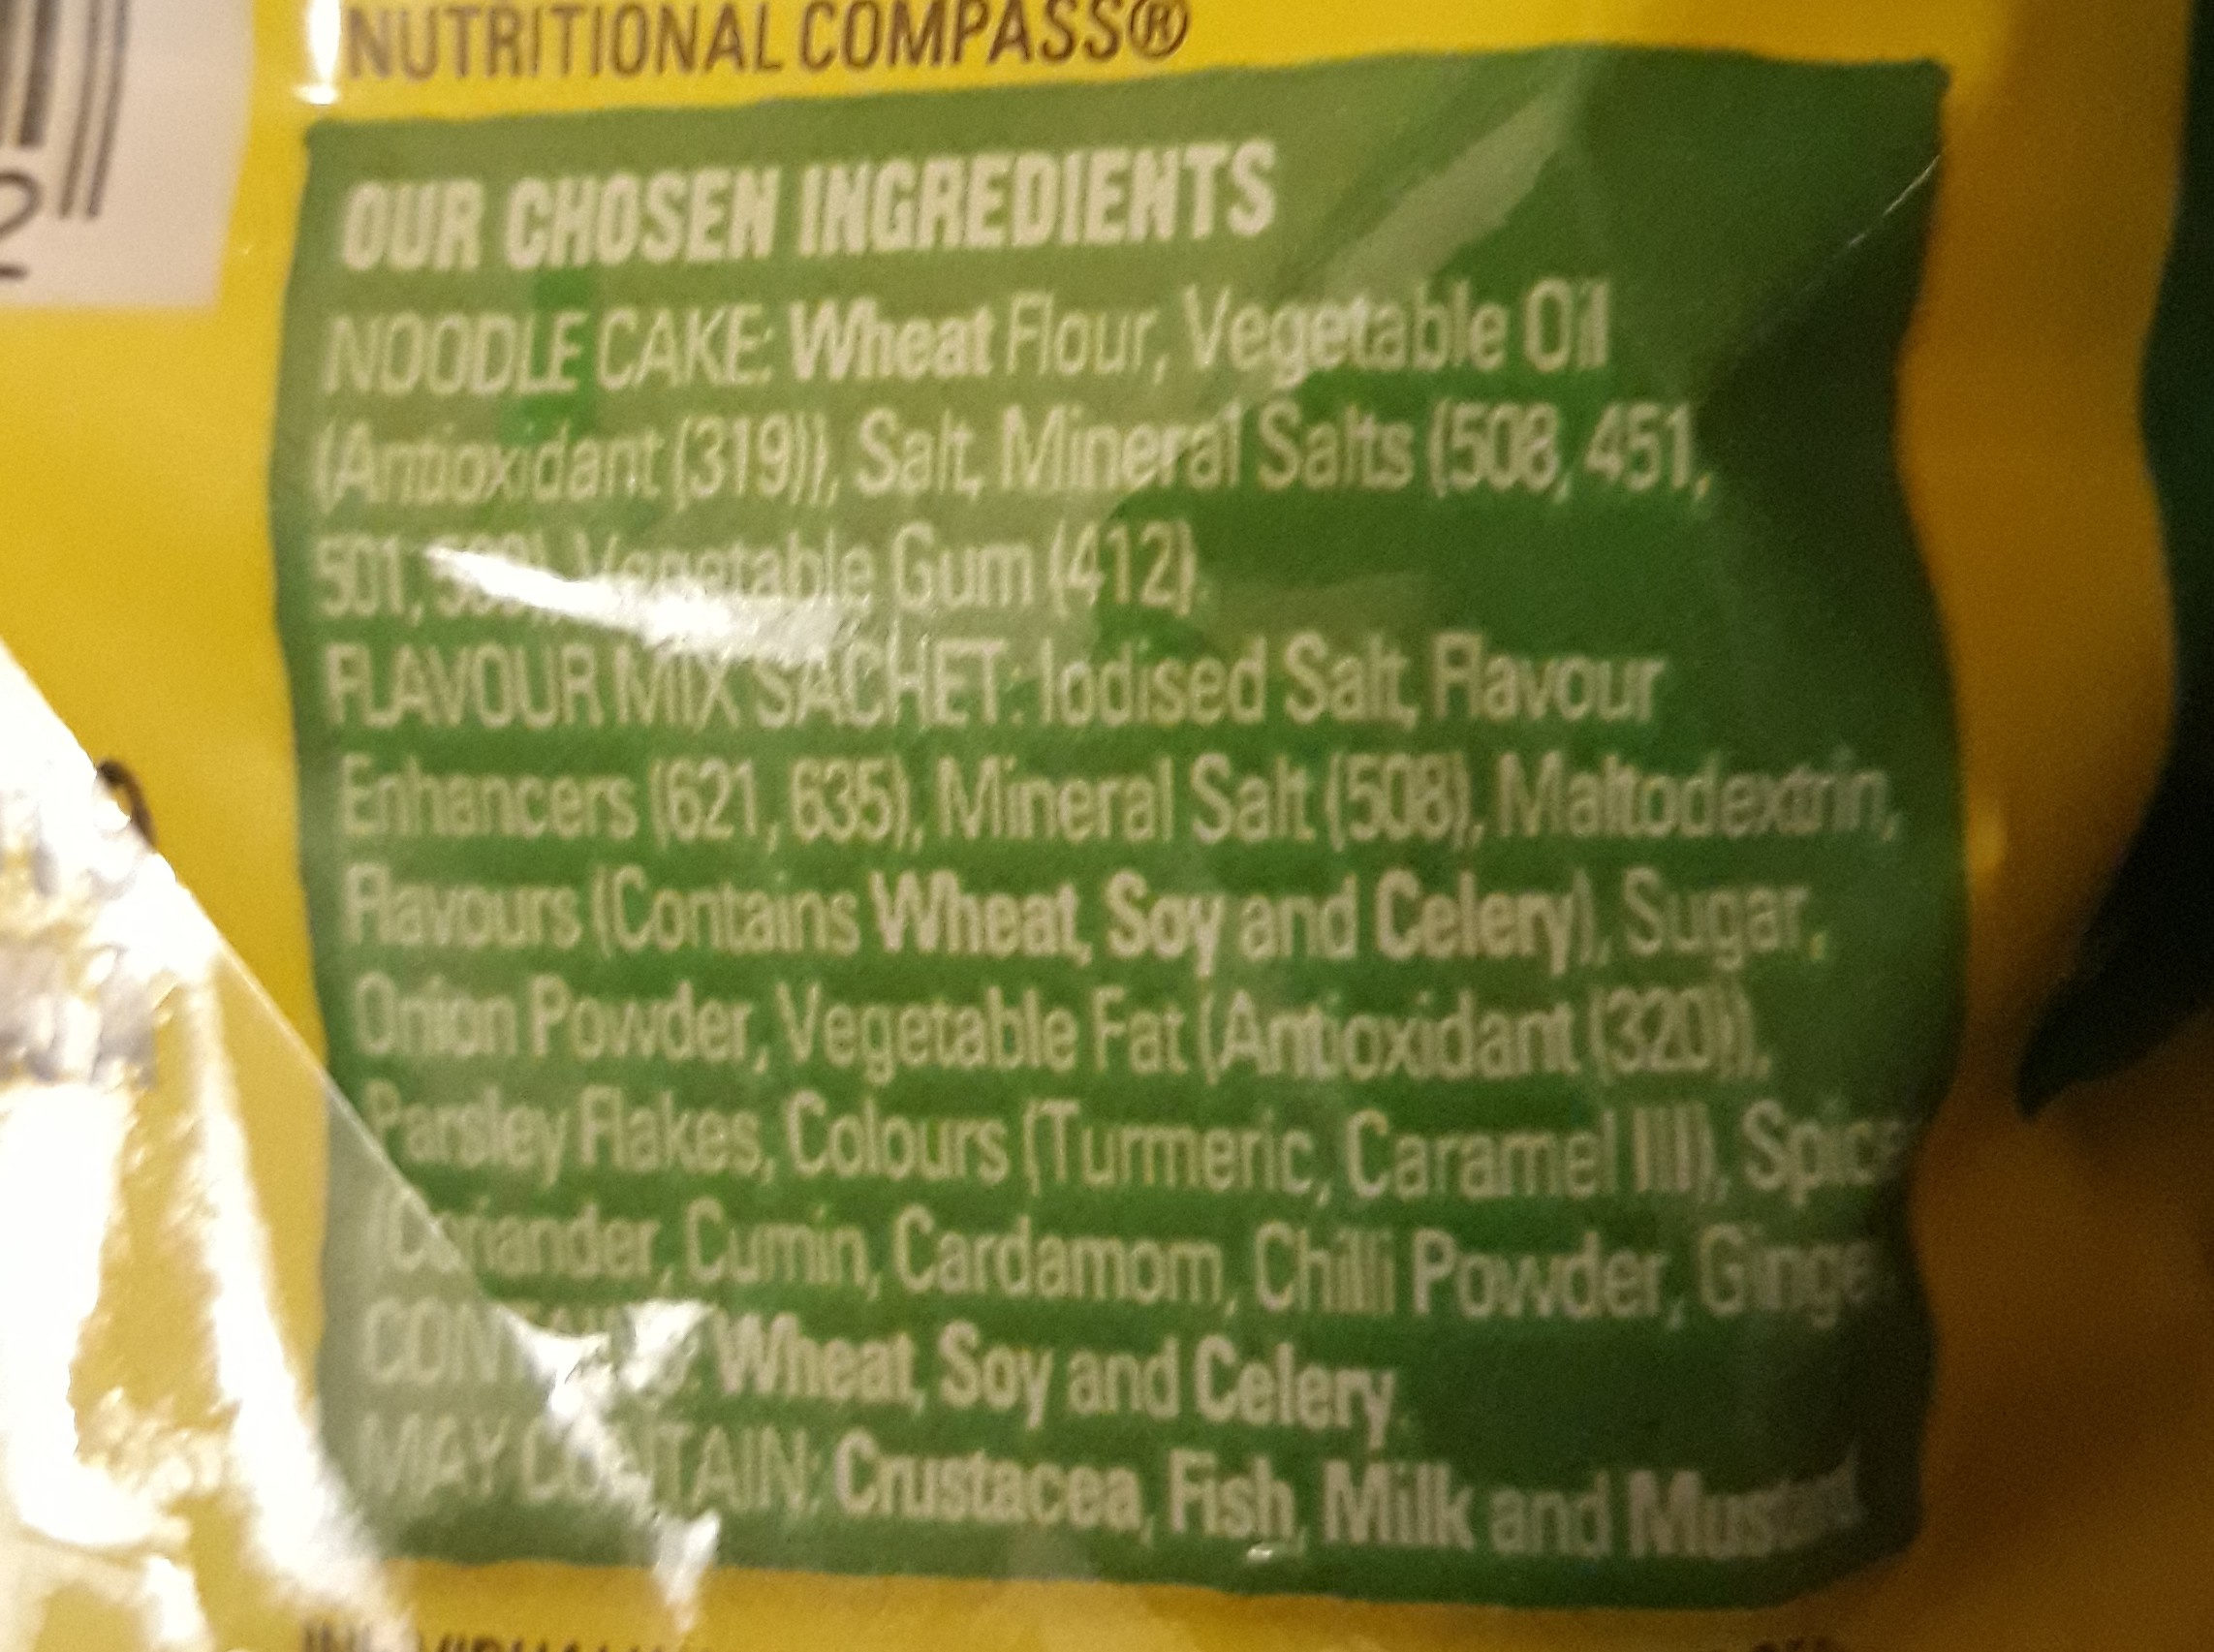 2 minute noodles chicken flavour - Ingredients - en